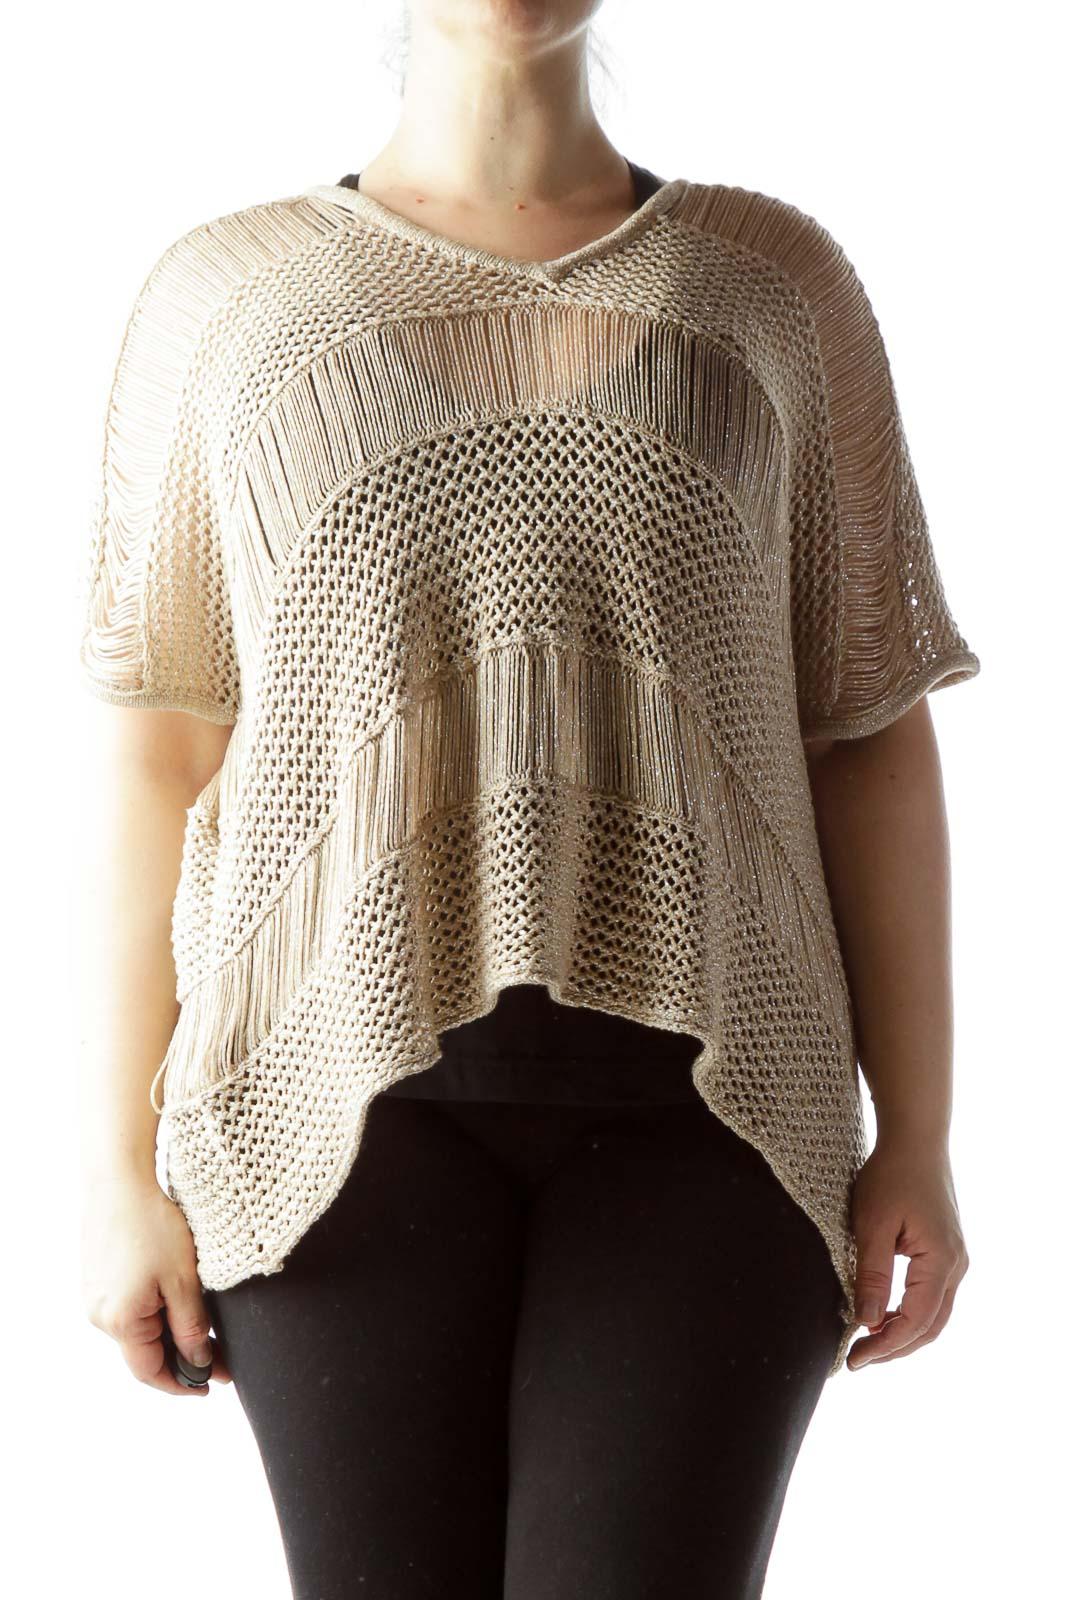 Beige Silver Metallic Thread Knit See-Through Top